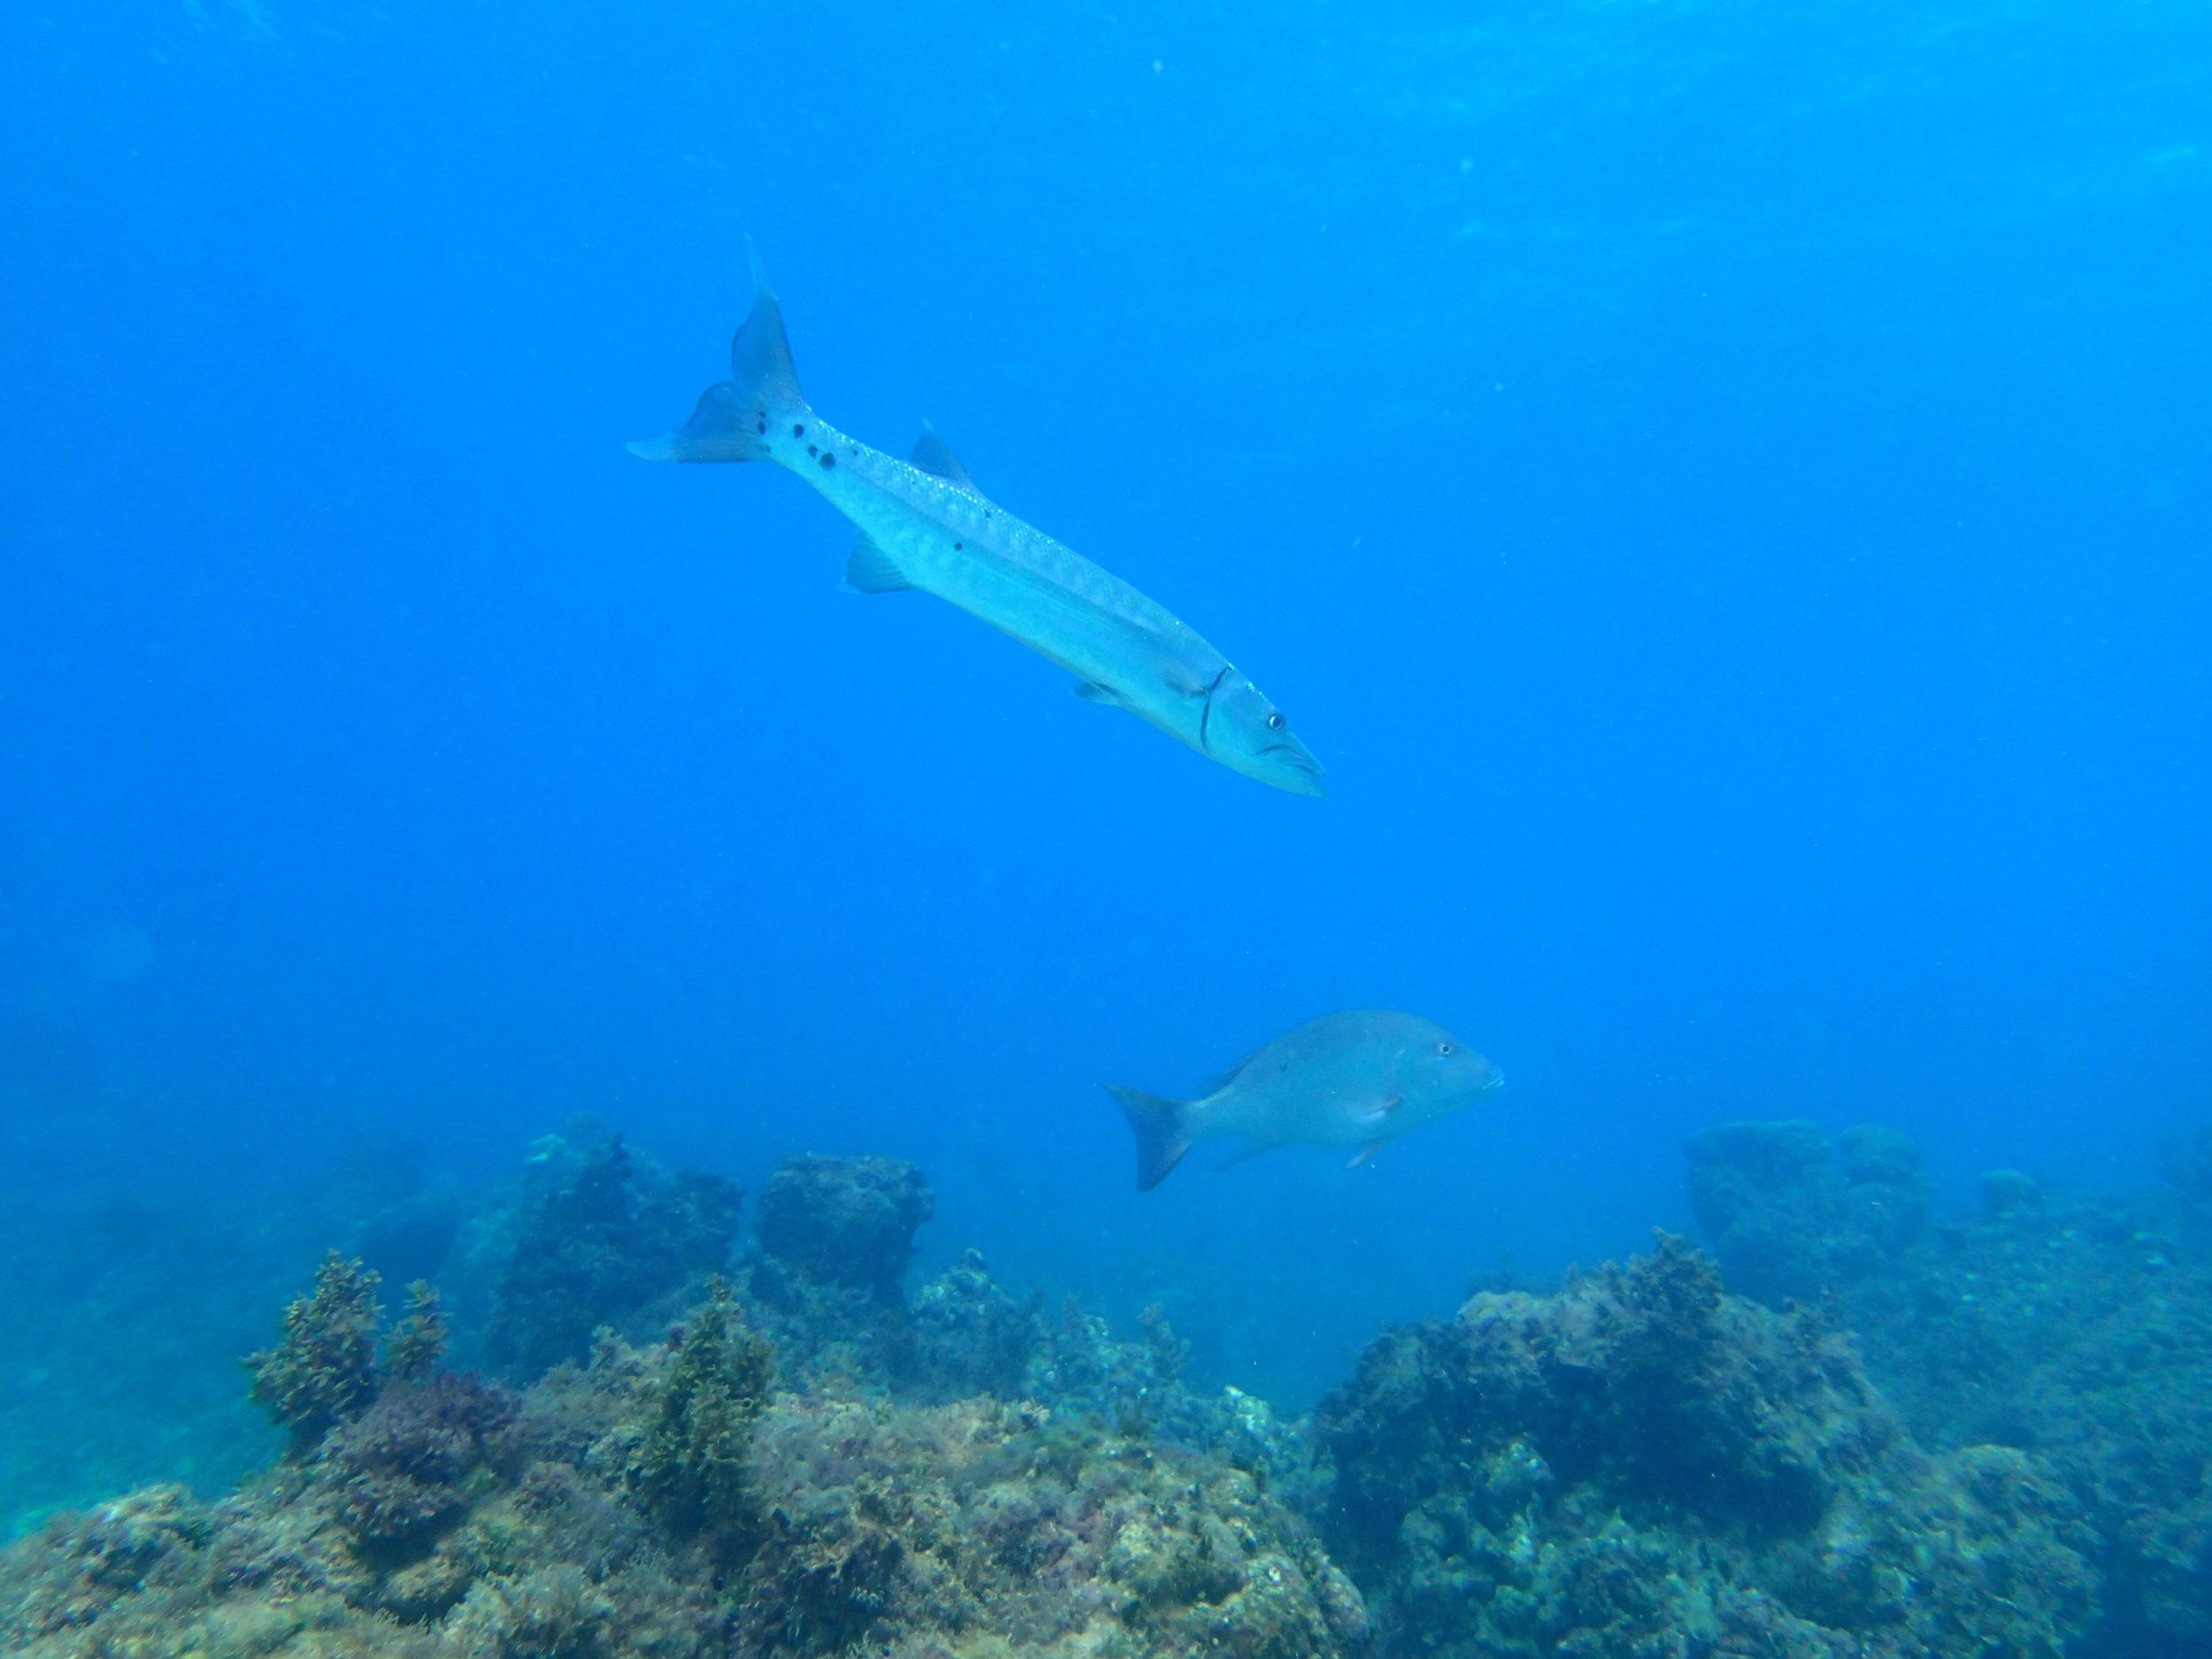 Mature fish at coral nursery array, Oracabessa Bay Fish Sanctuary